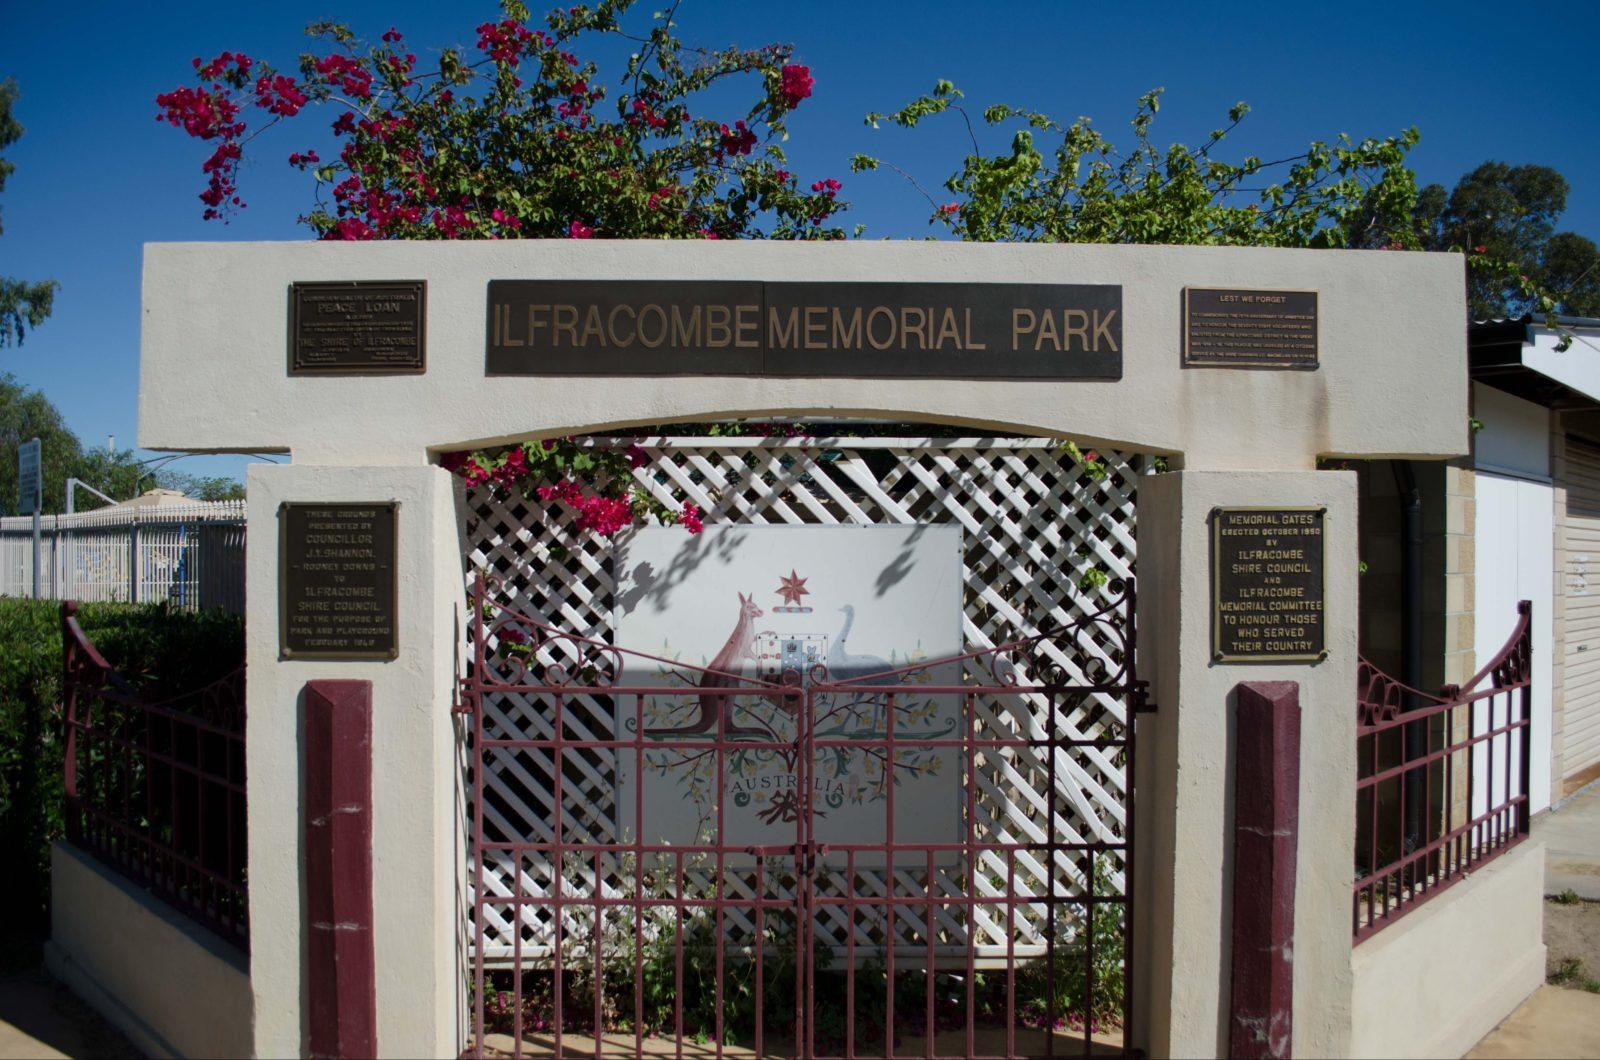 Ilfracombe Memorial Park